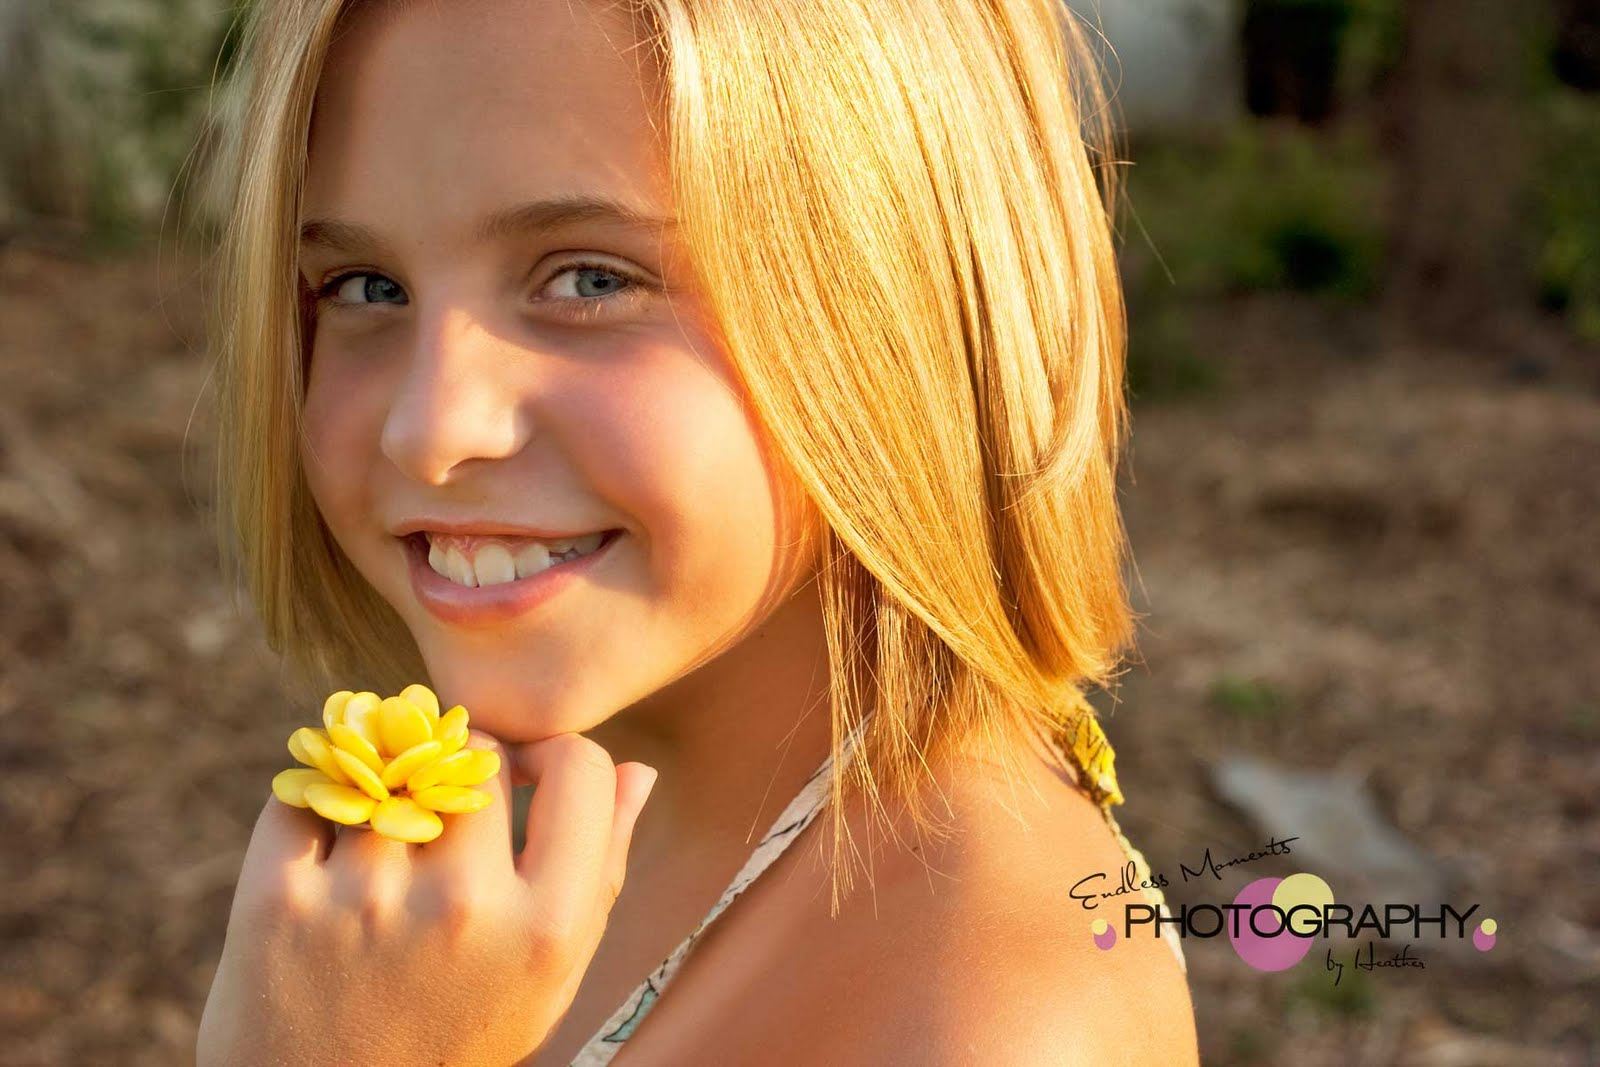 My Little Girl, My Favorite Model